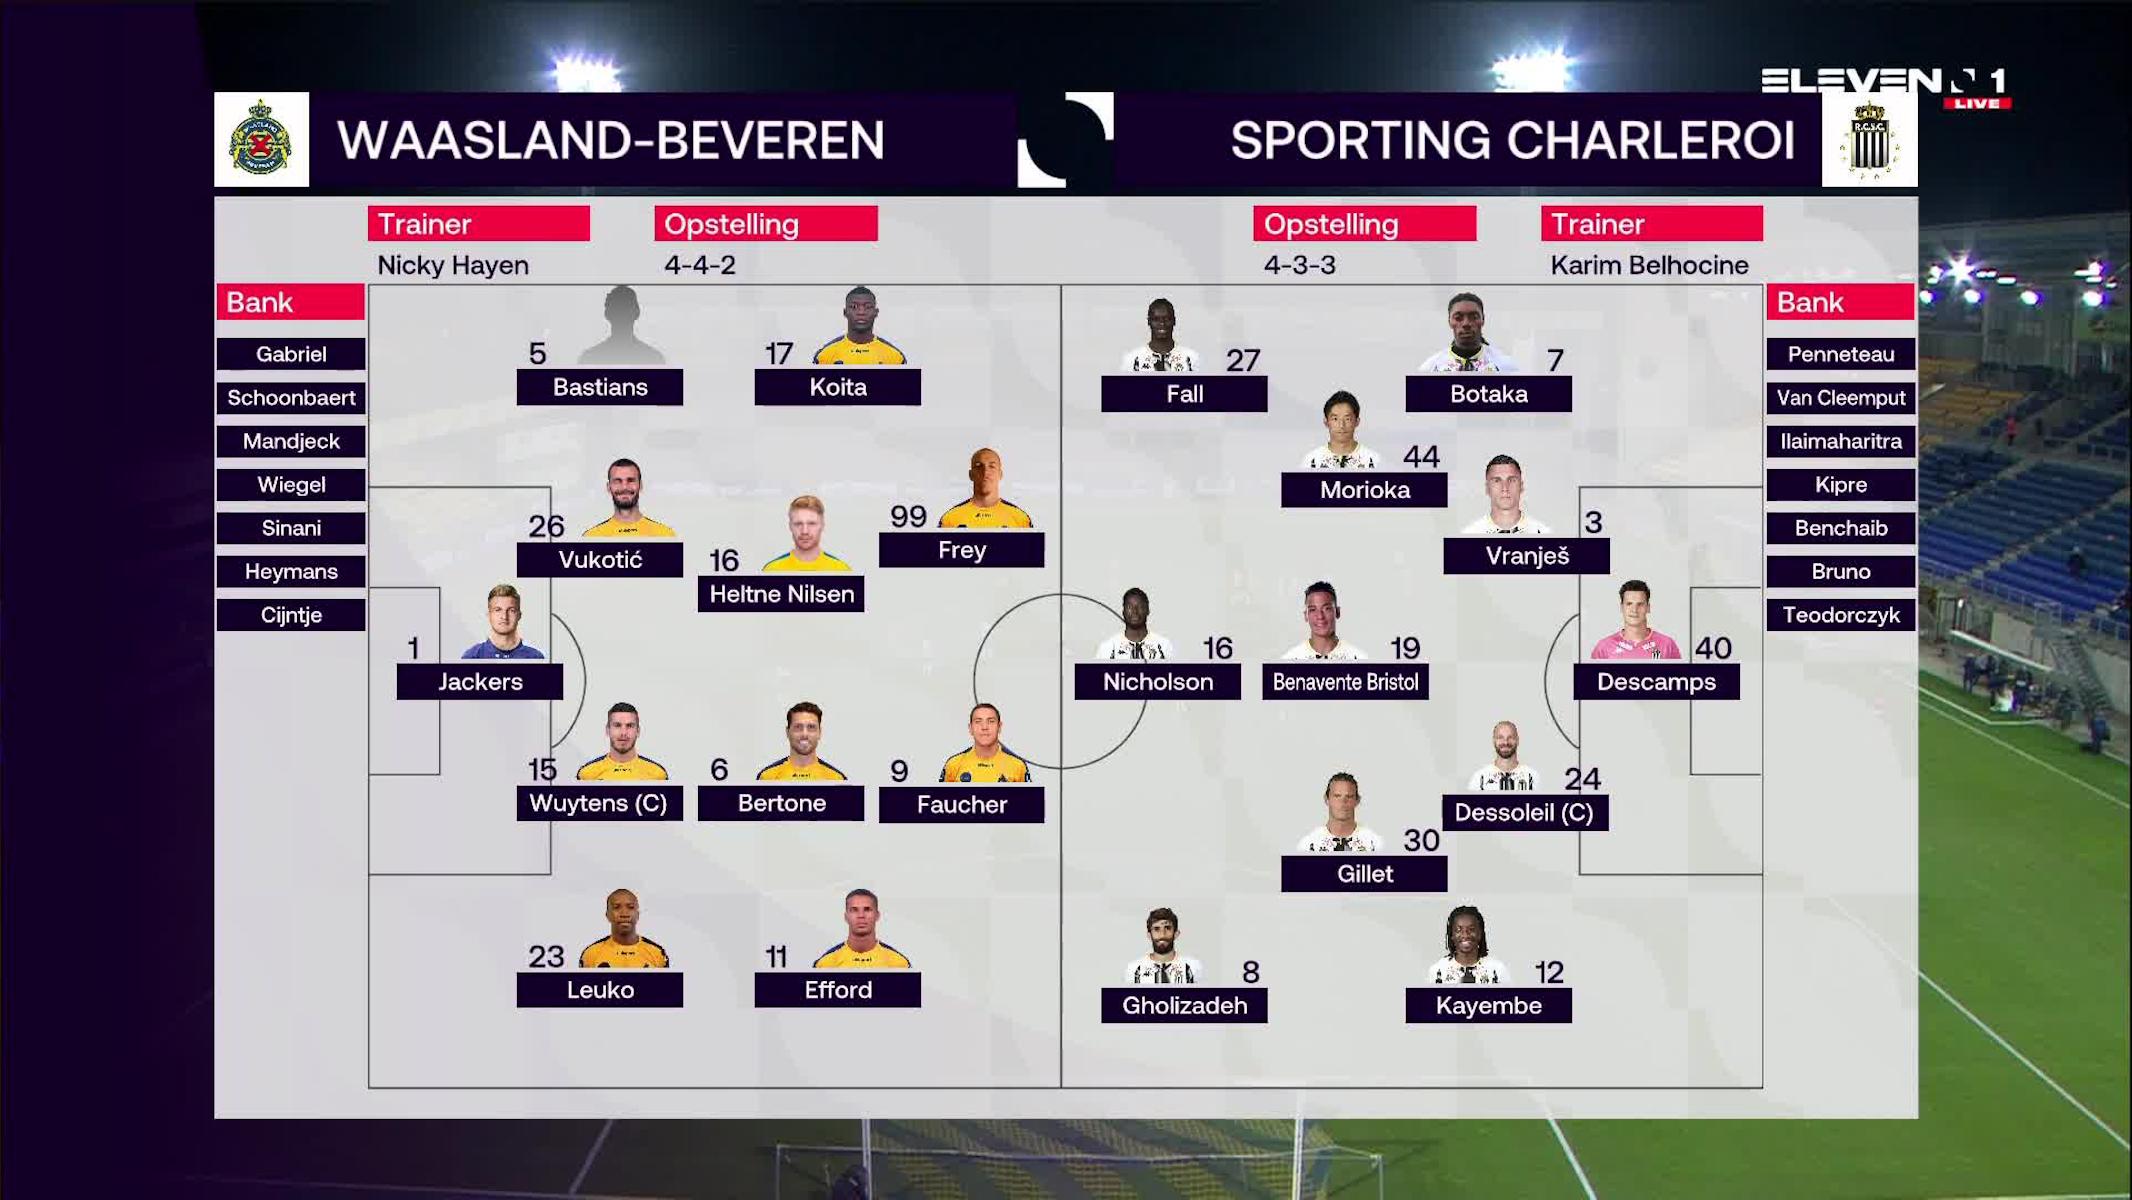 Samenvatting Waasland-Beveren vs. Sporting Charleroi